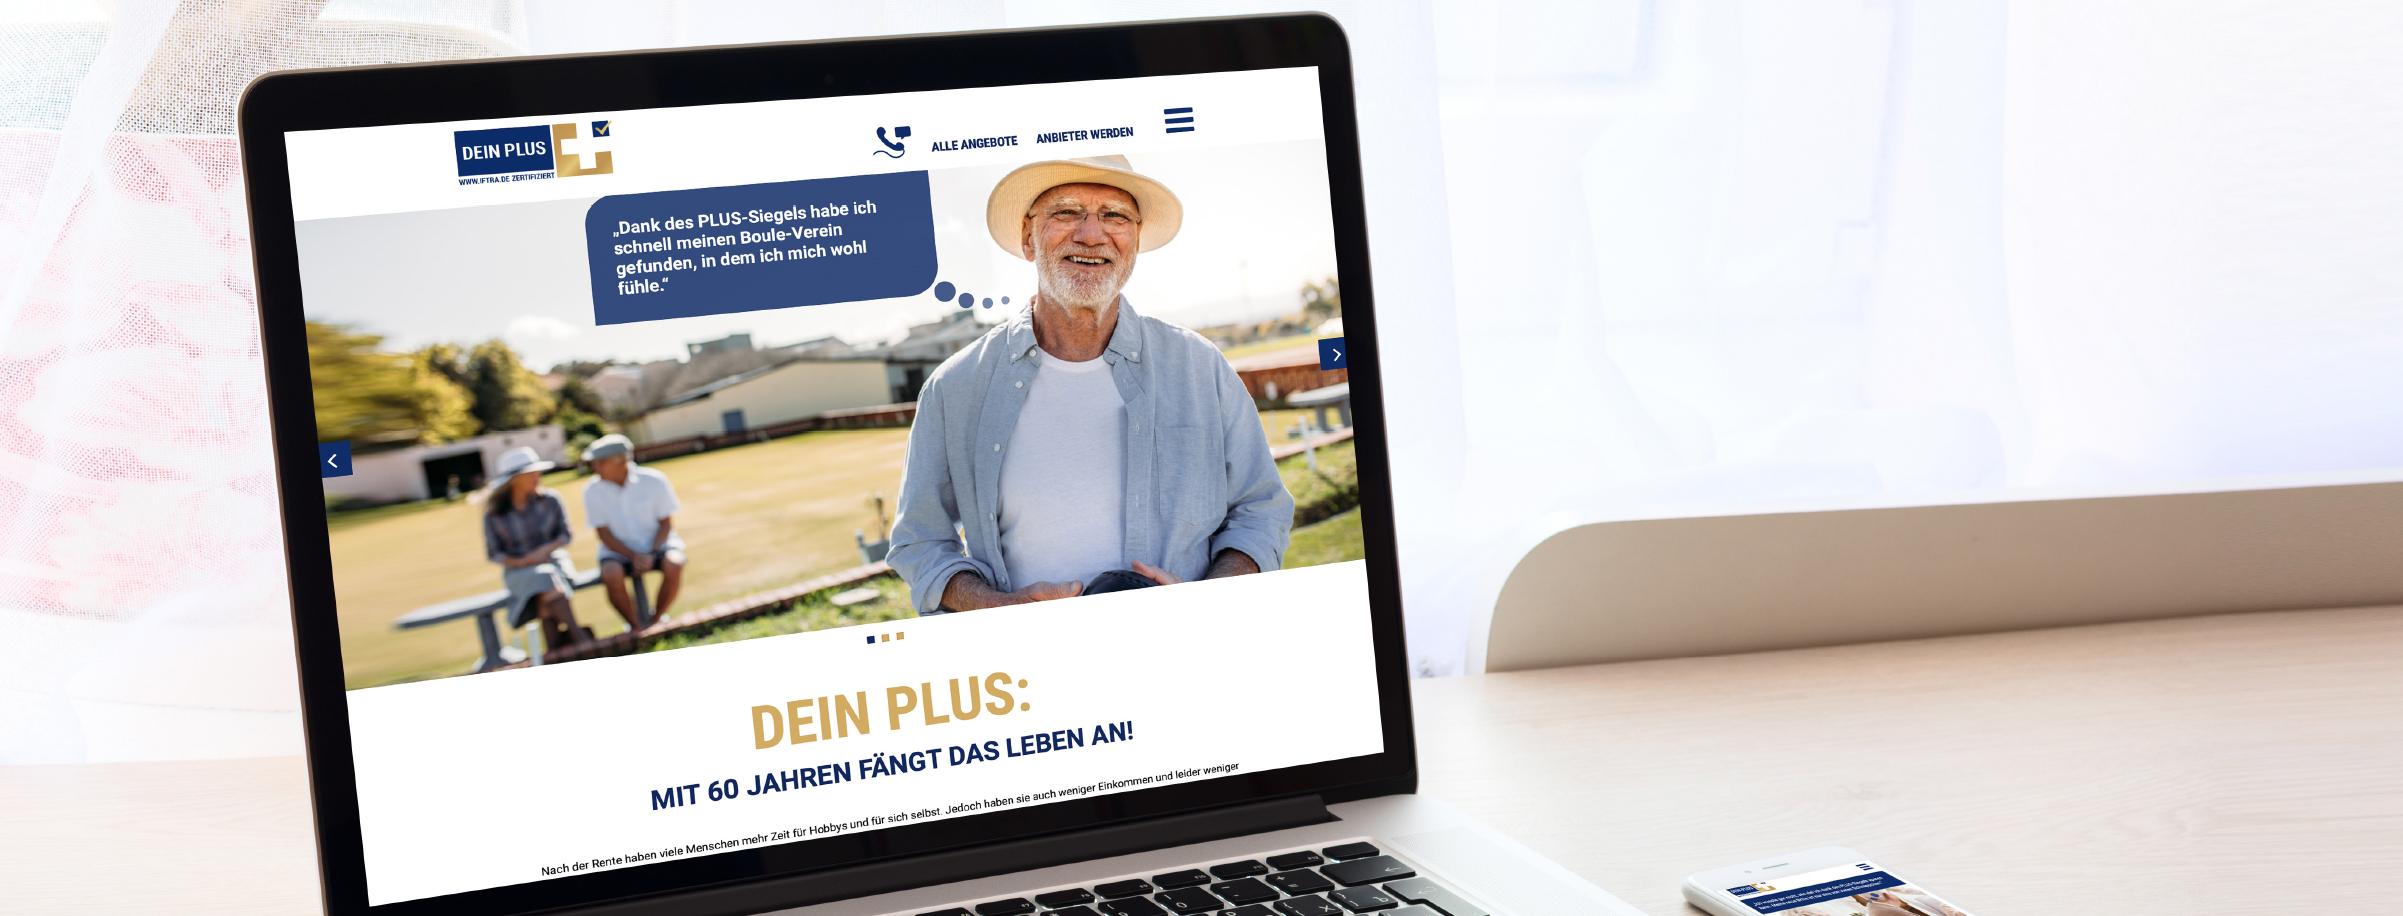 agentur beratung vertrieb sales cold calls mannheim